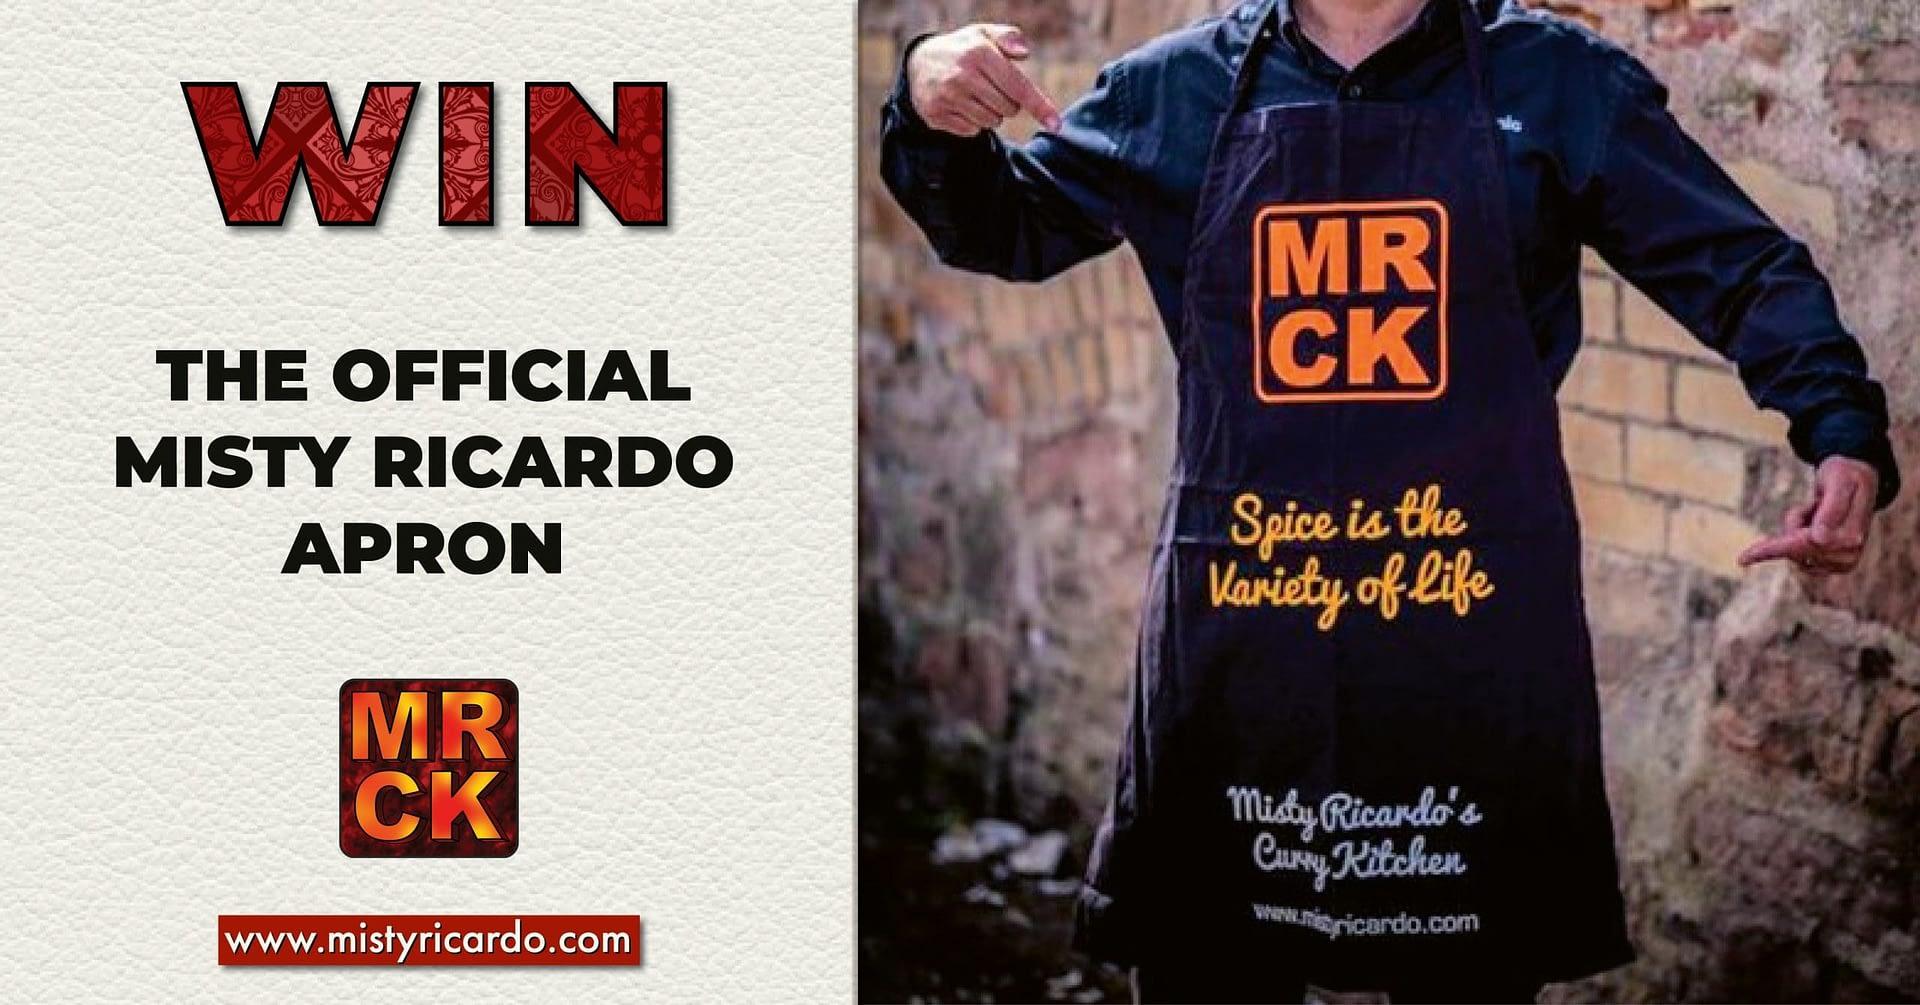 Win the Misty Ricardo Apron